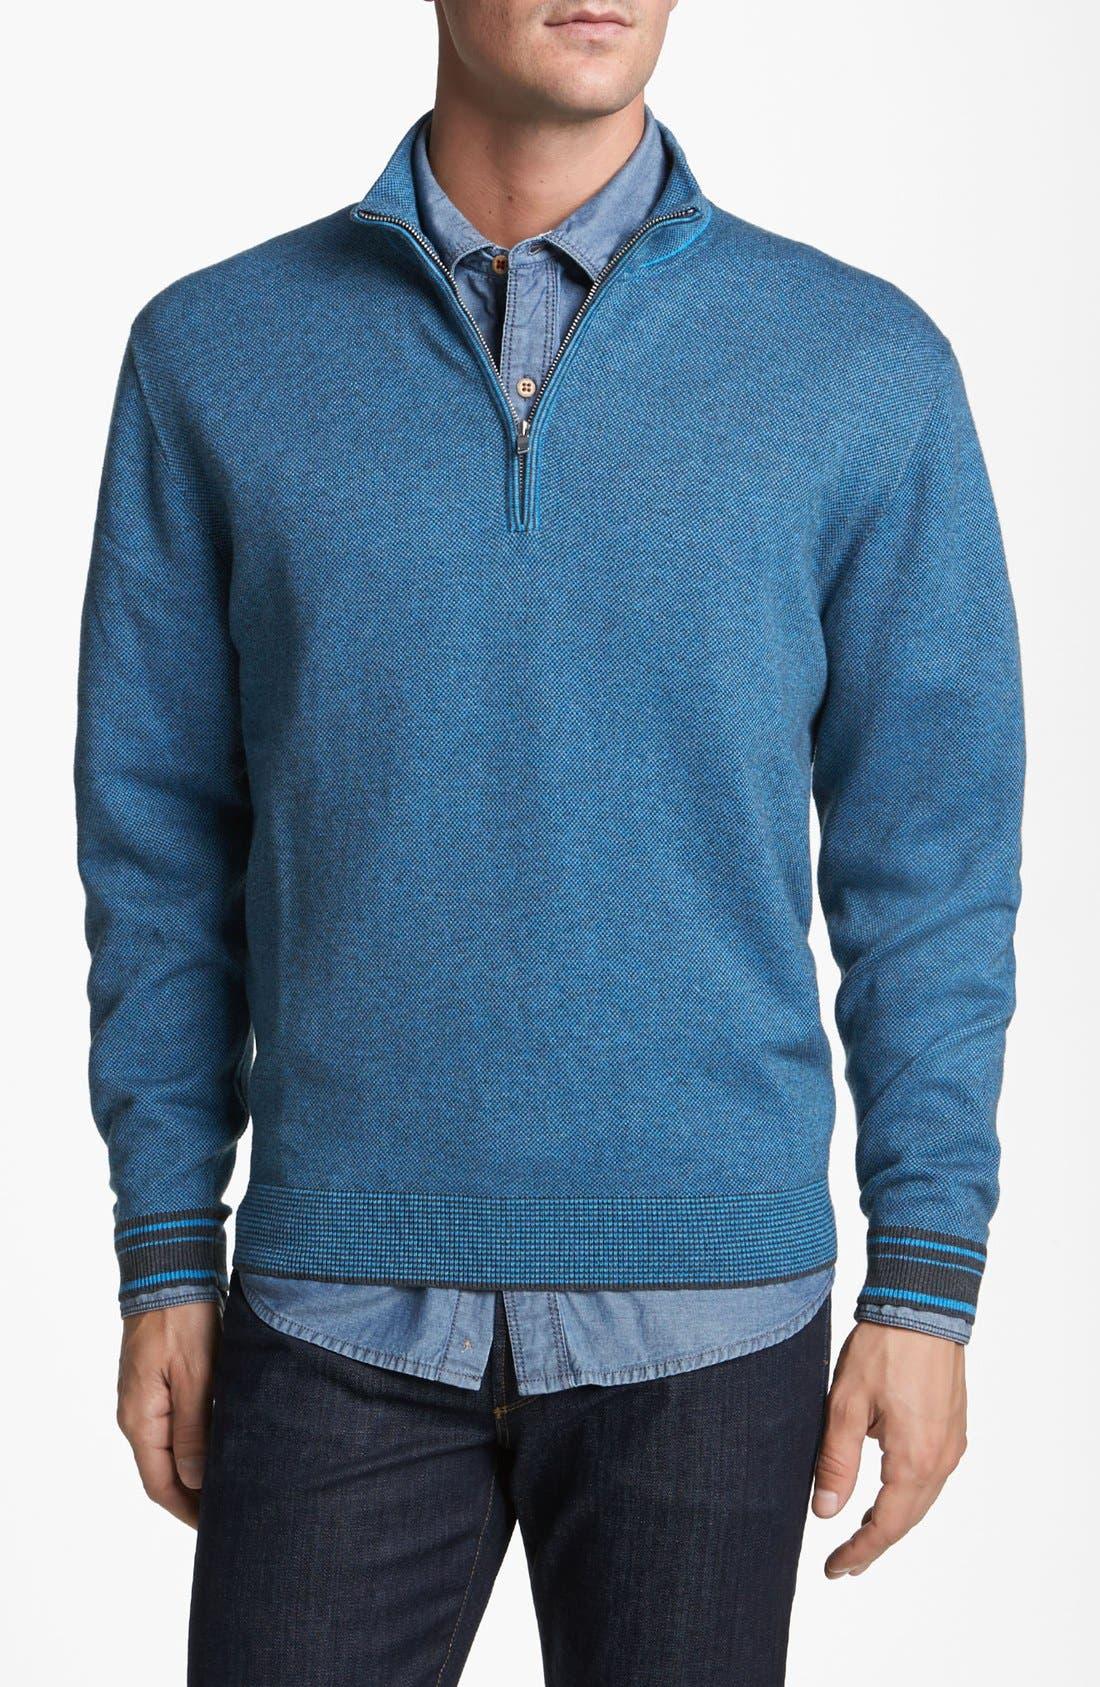 Main Image - Cutter & Buck 'Haven' Half Zip Bird's Eye Sweater (Big & Tall)